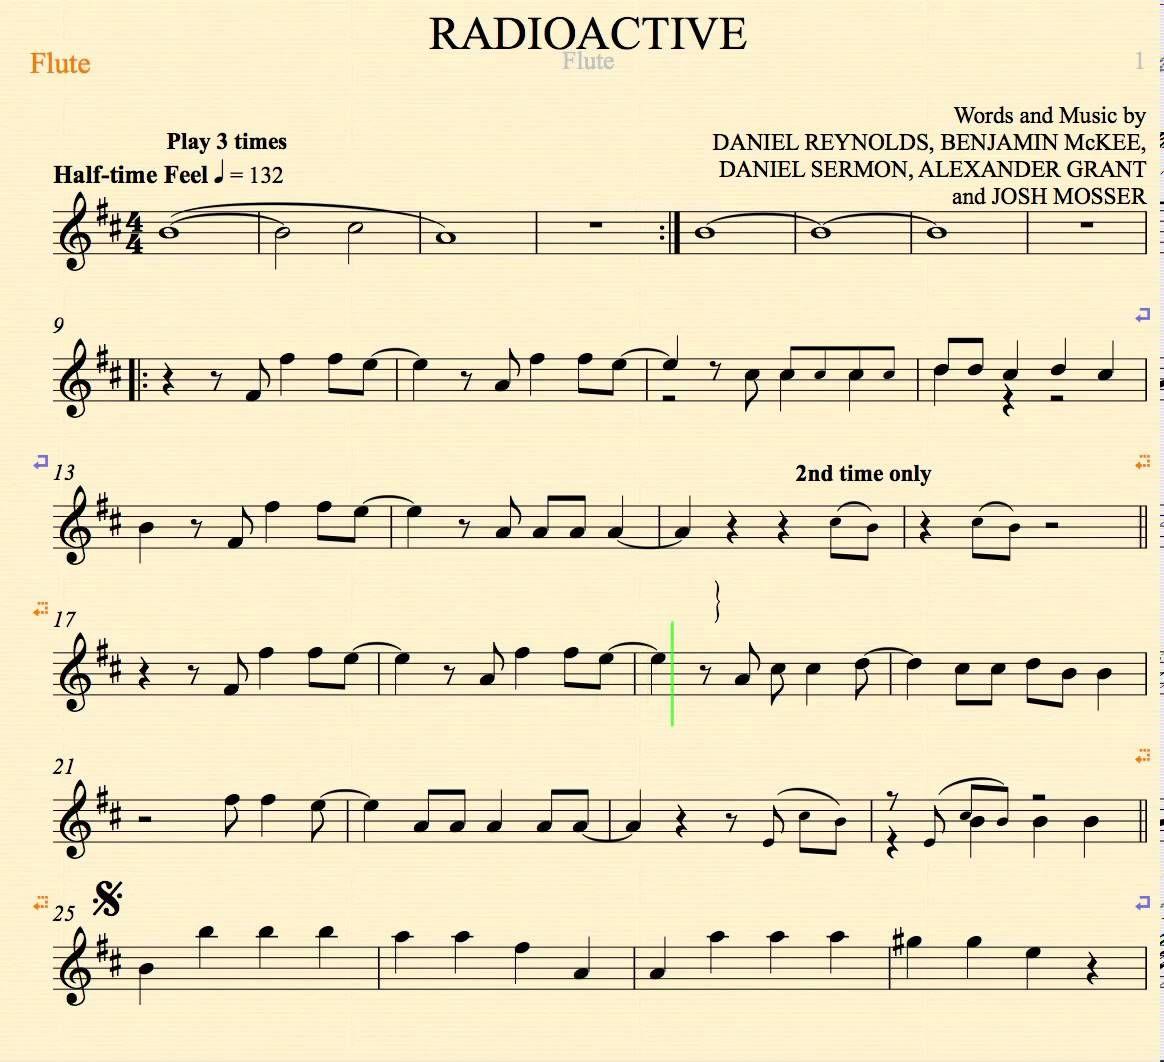 Radioactive Imagine Dragons Easy Piano Sheet Music Free - radioactive imagine dragon free piano ...